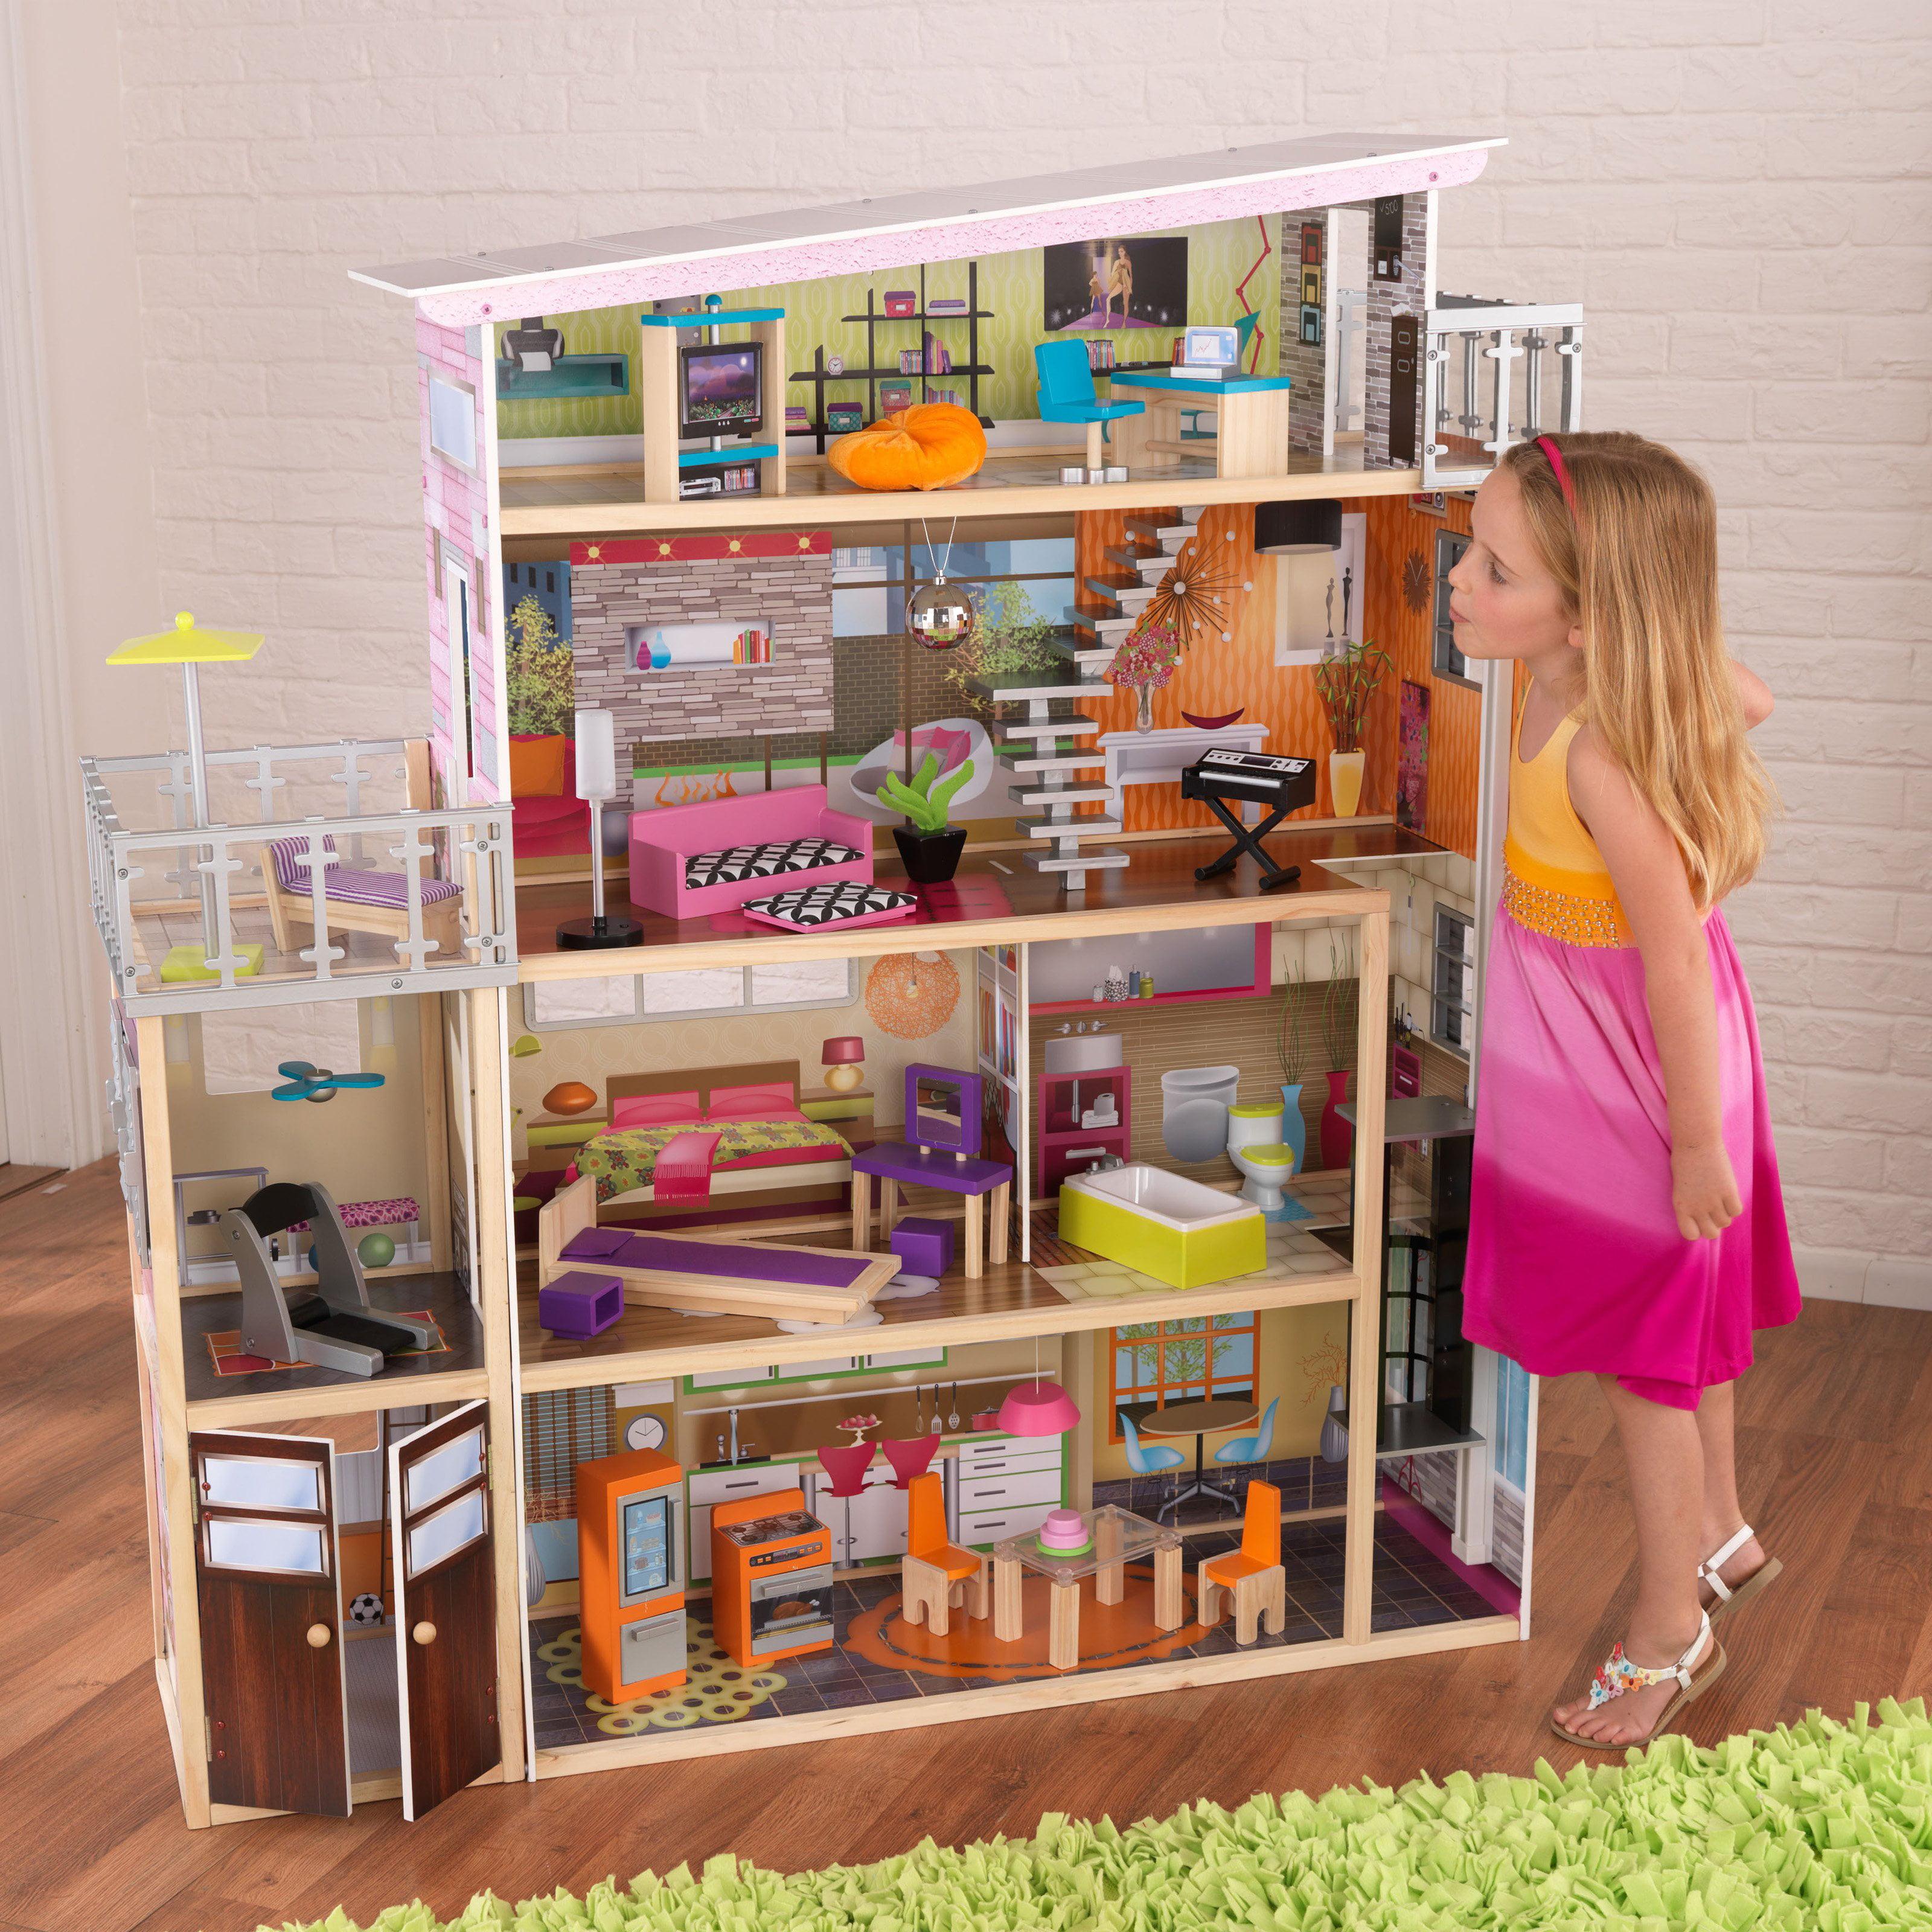 Kids craft doll house - Kids Craft Doll House 54